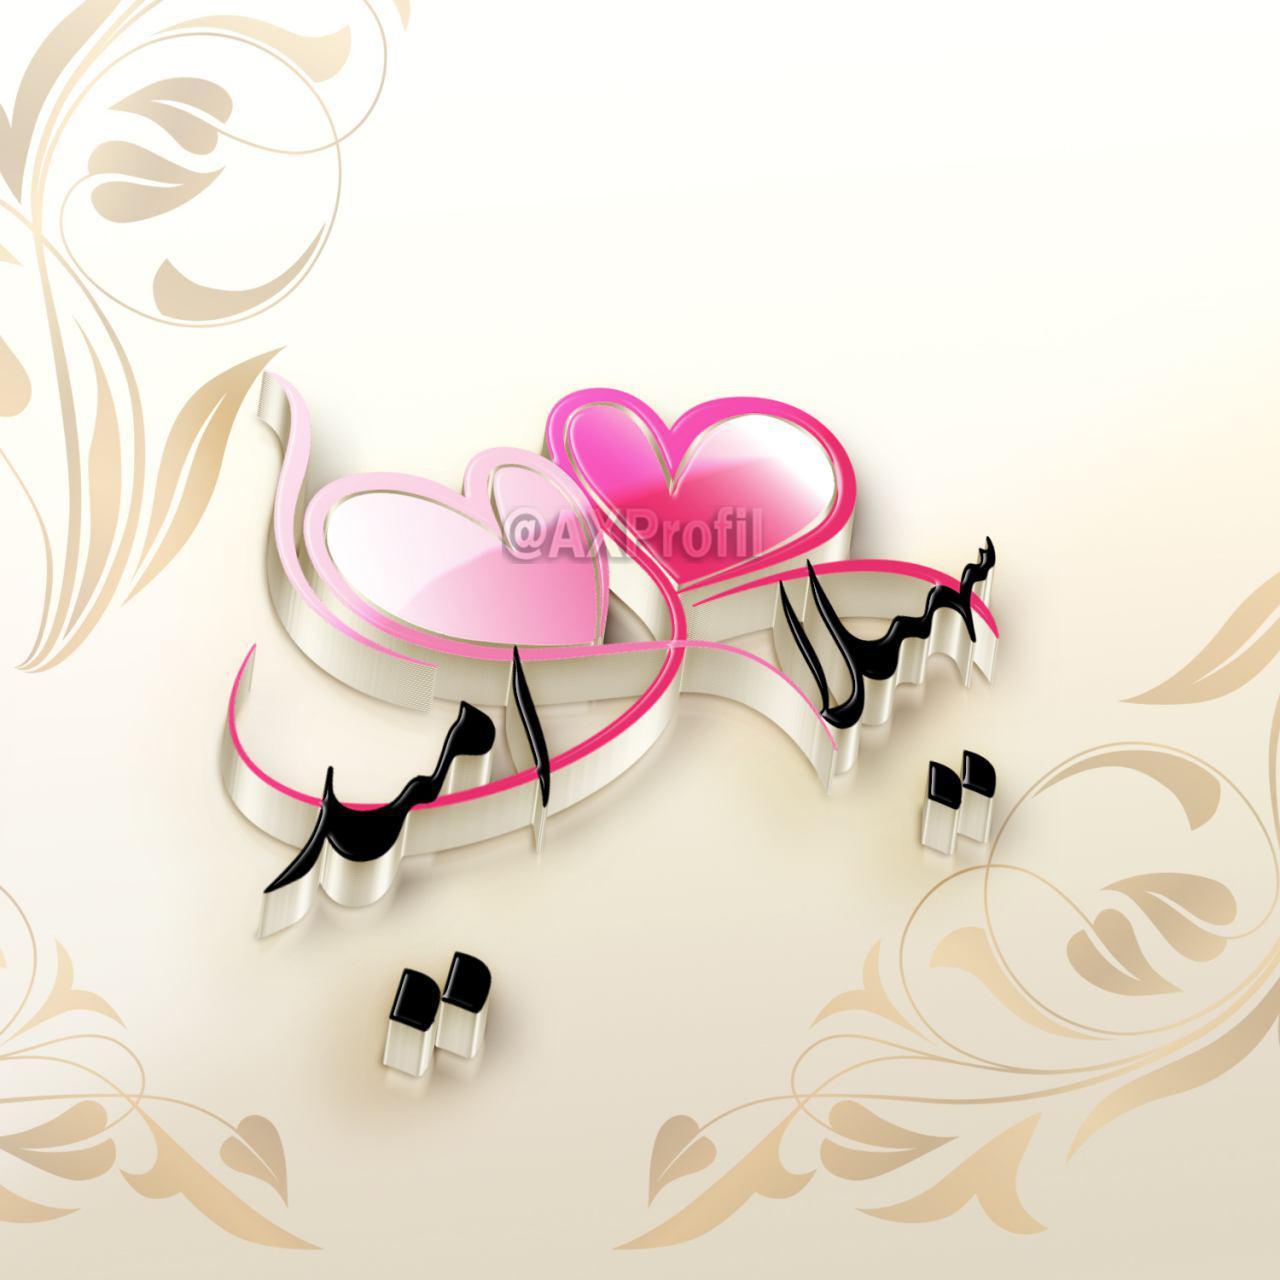 عکس پروفایل عاشقانه اسم سهیلا و امید